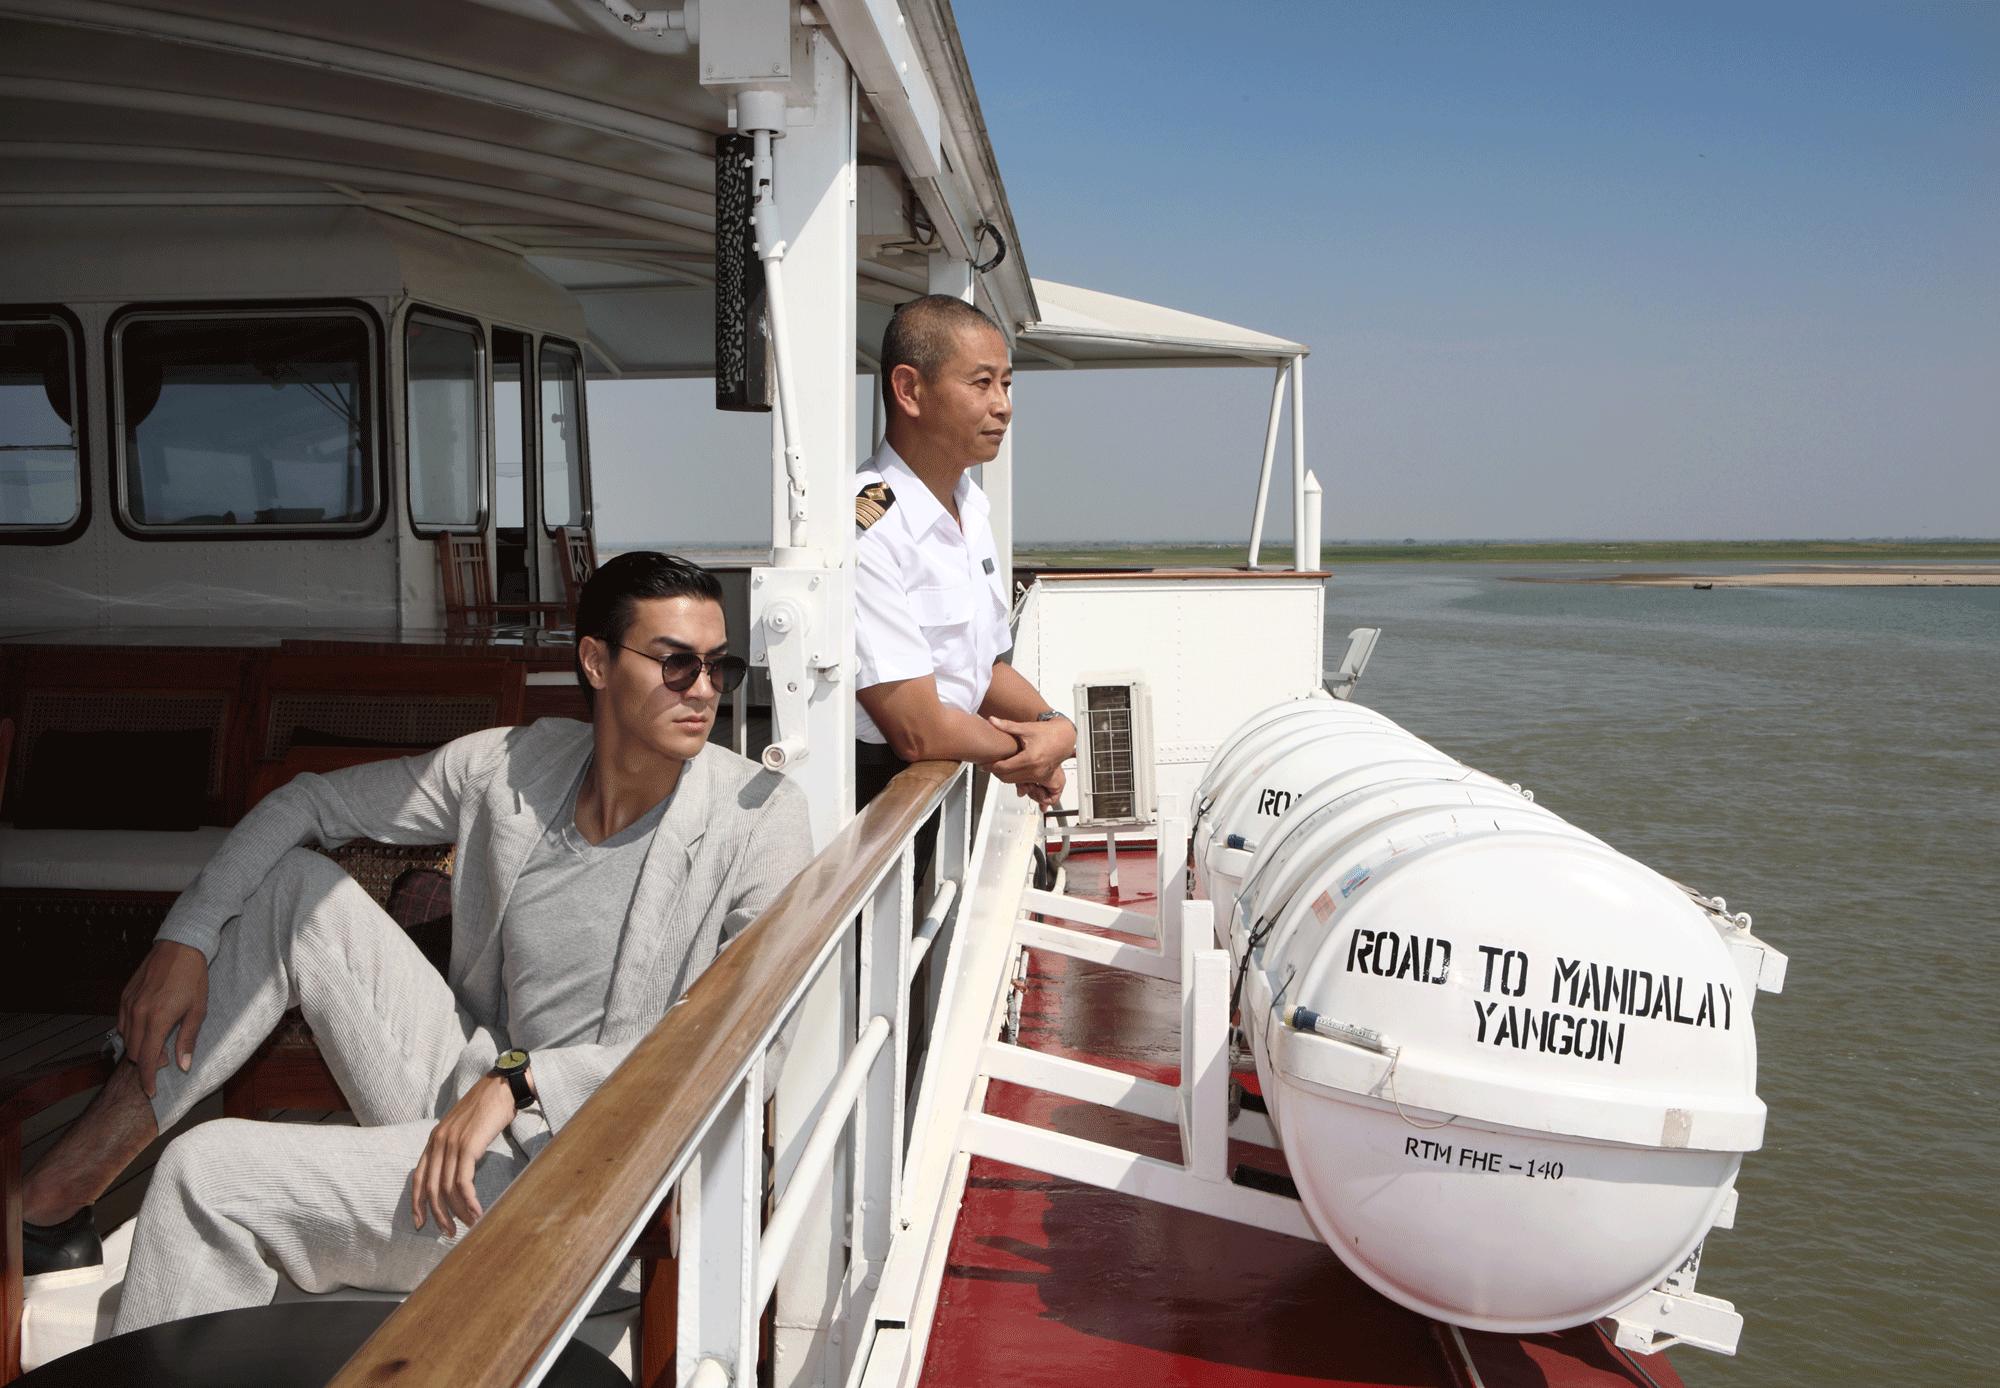 suit : Emporio Armani / tshirt : JOCKEY / sunglasses : SPEKTRE / watch : FORREST